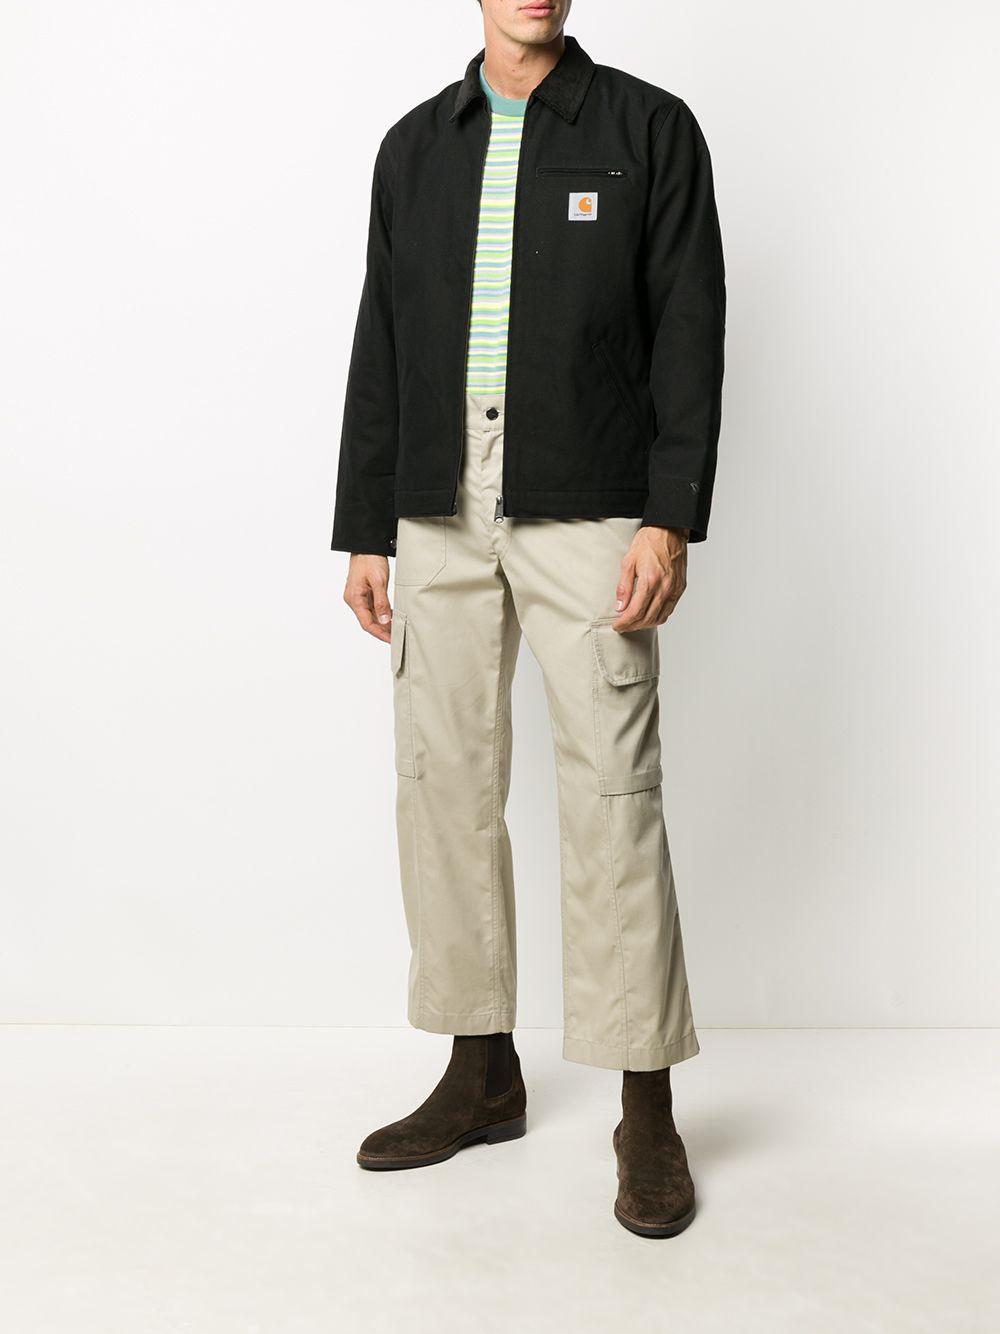 giacca detroit uomo nera in cotone CARHARTT WIP | Giacche | I02842400E.01